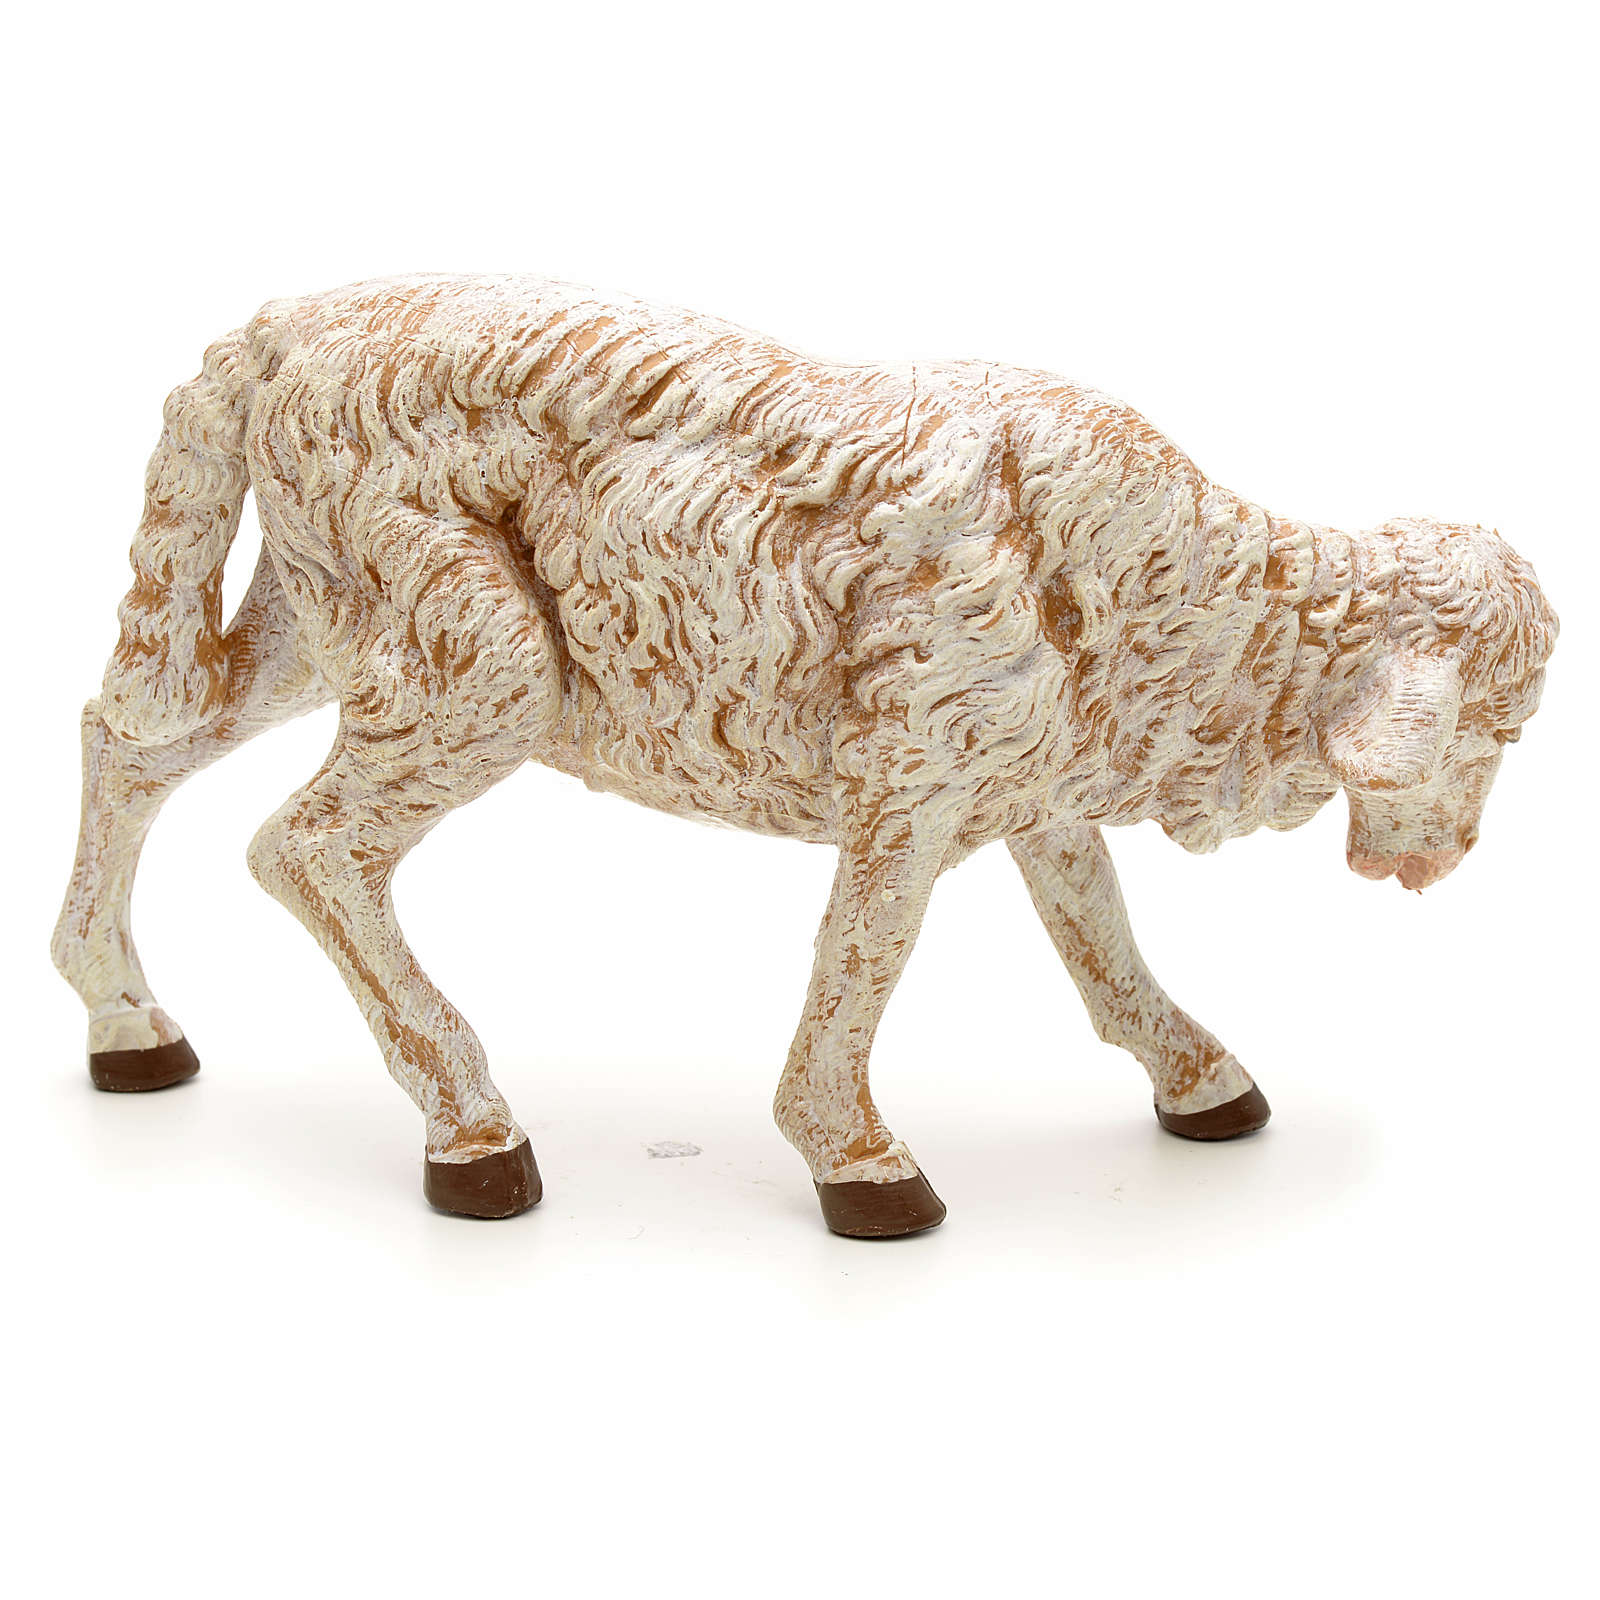 Owca pasąca się 30 cm Fontanini 4